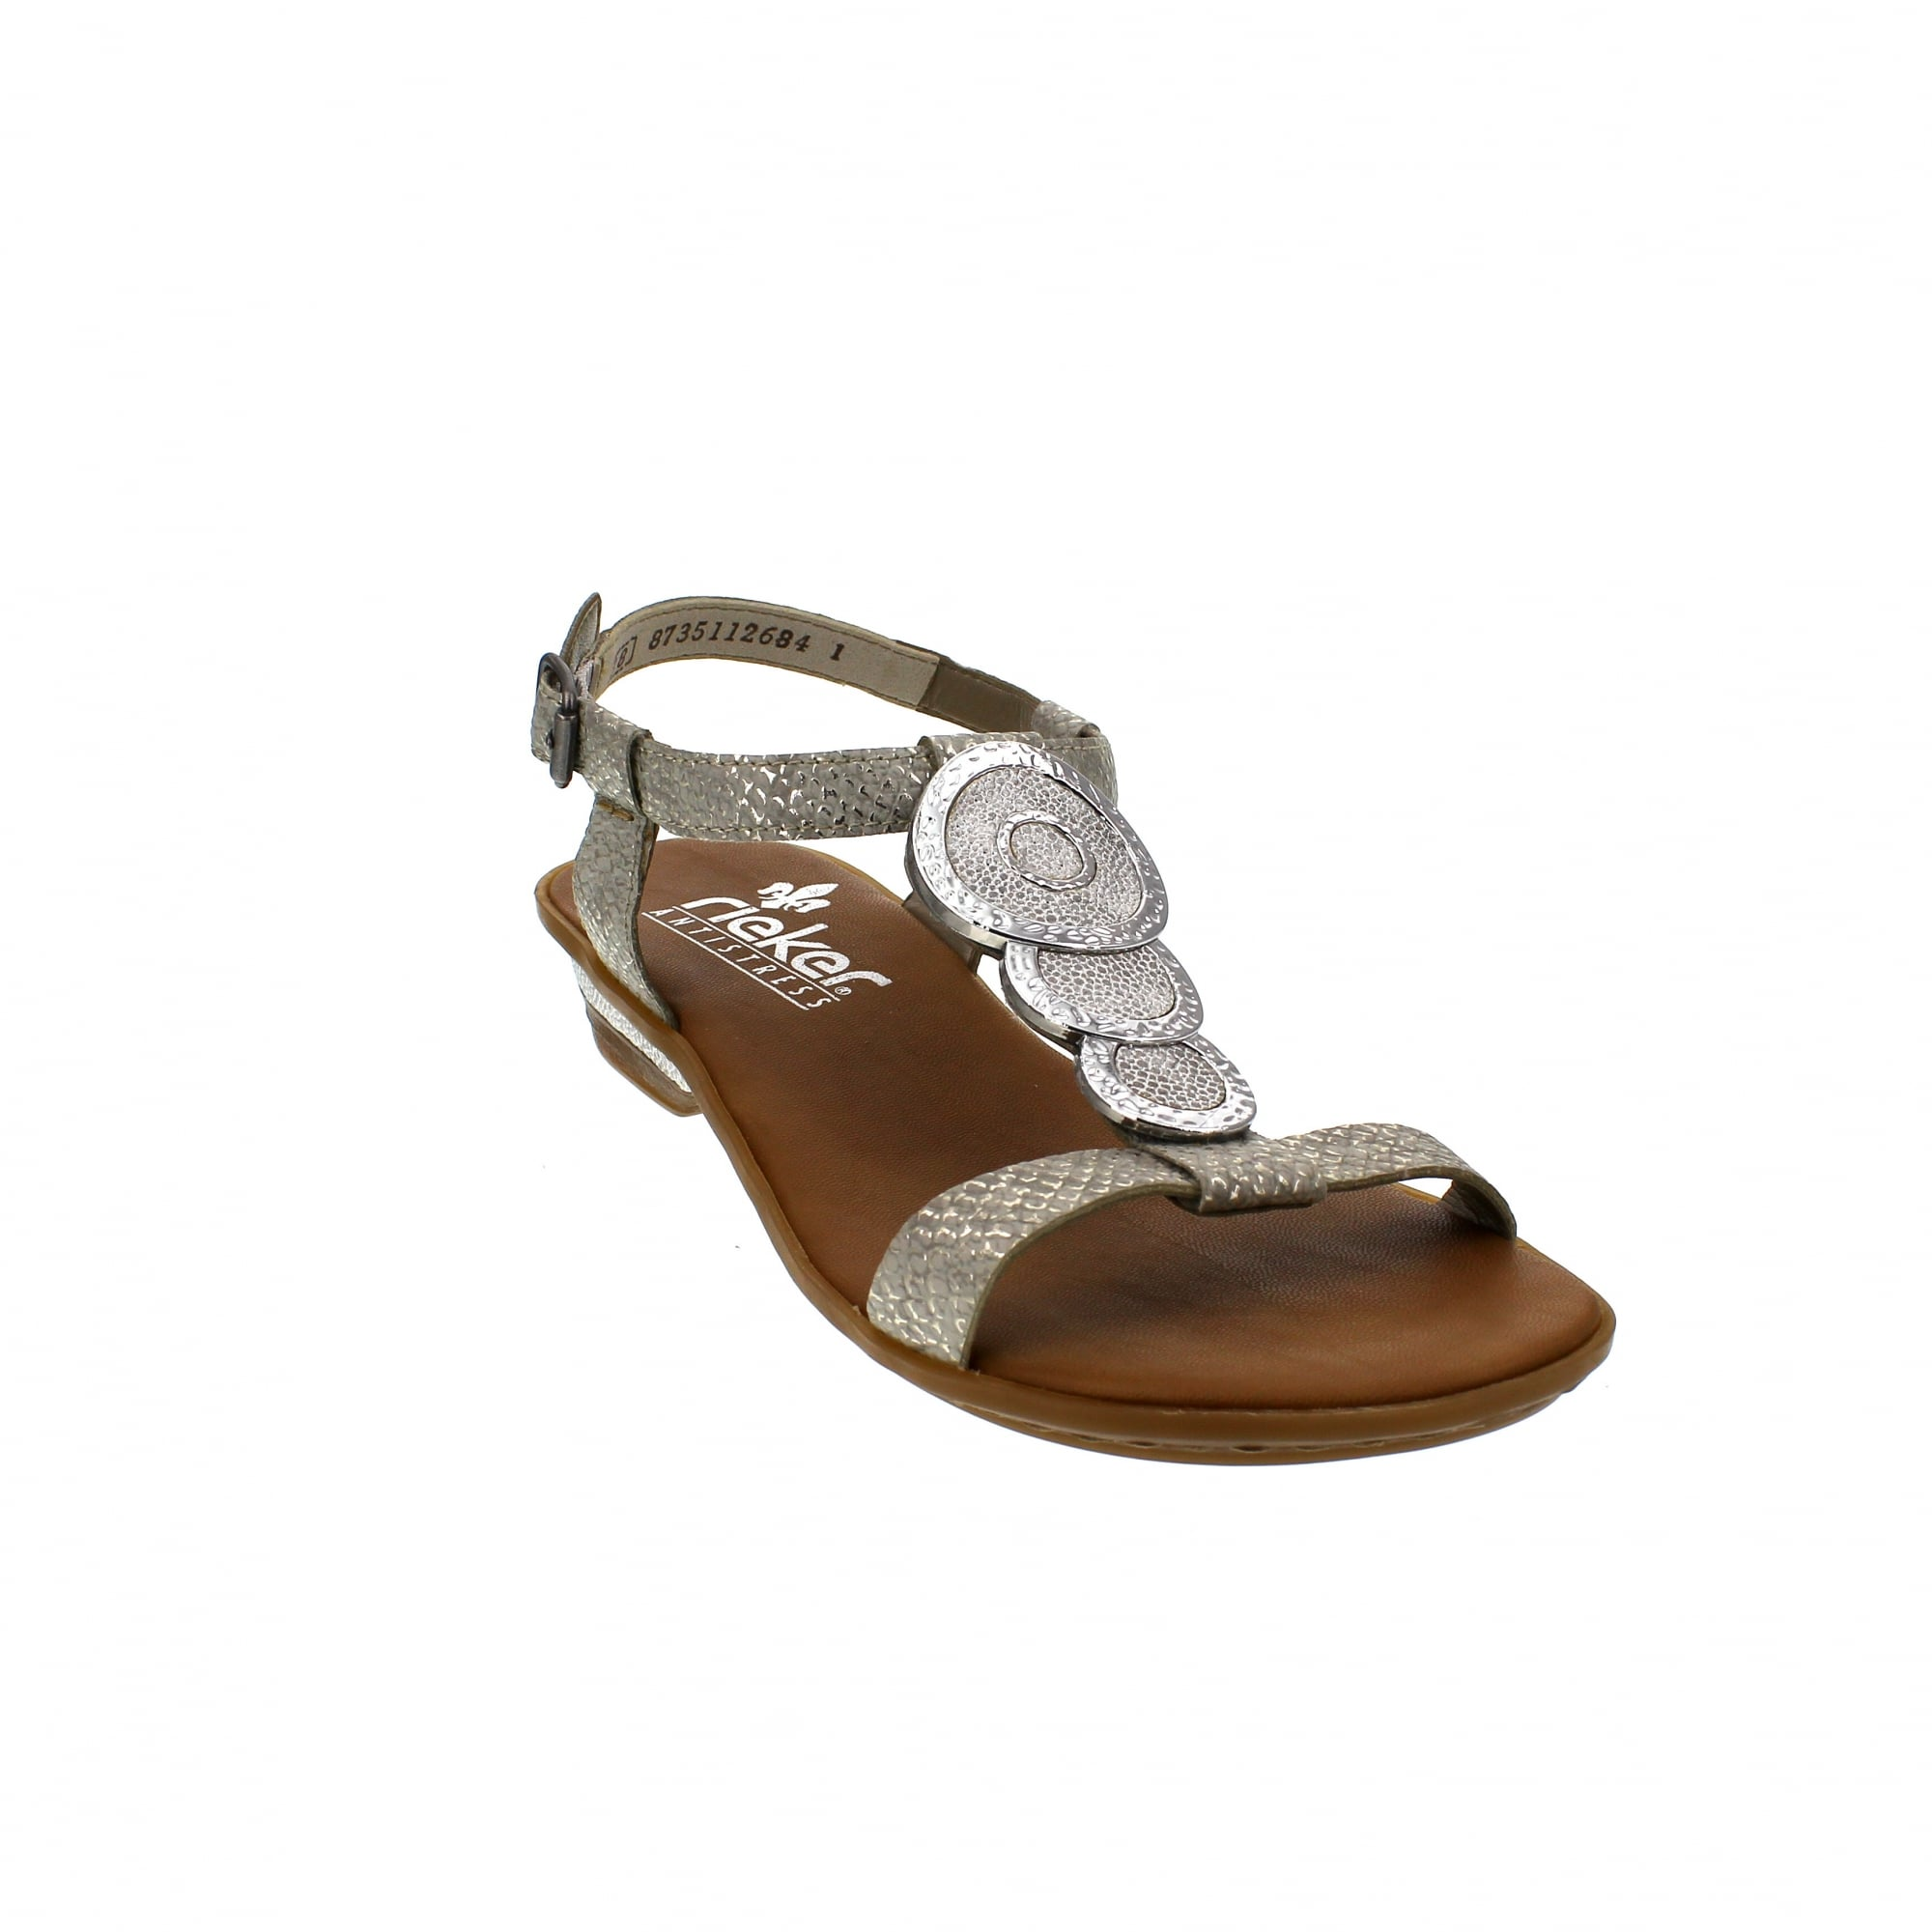 2441936c6f75 Rieker 63478-80 Off White Silver Womens Sandals